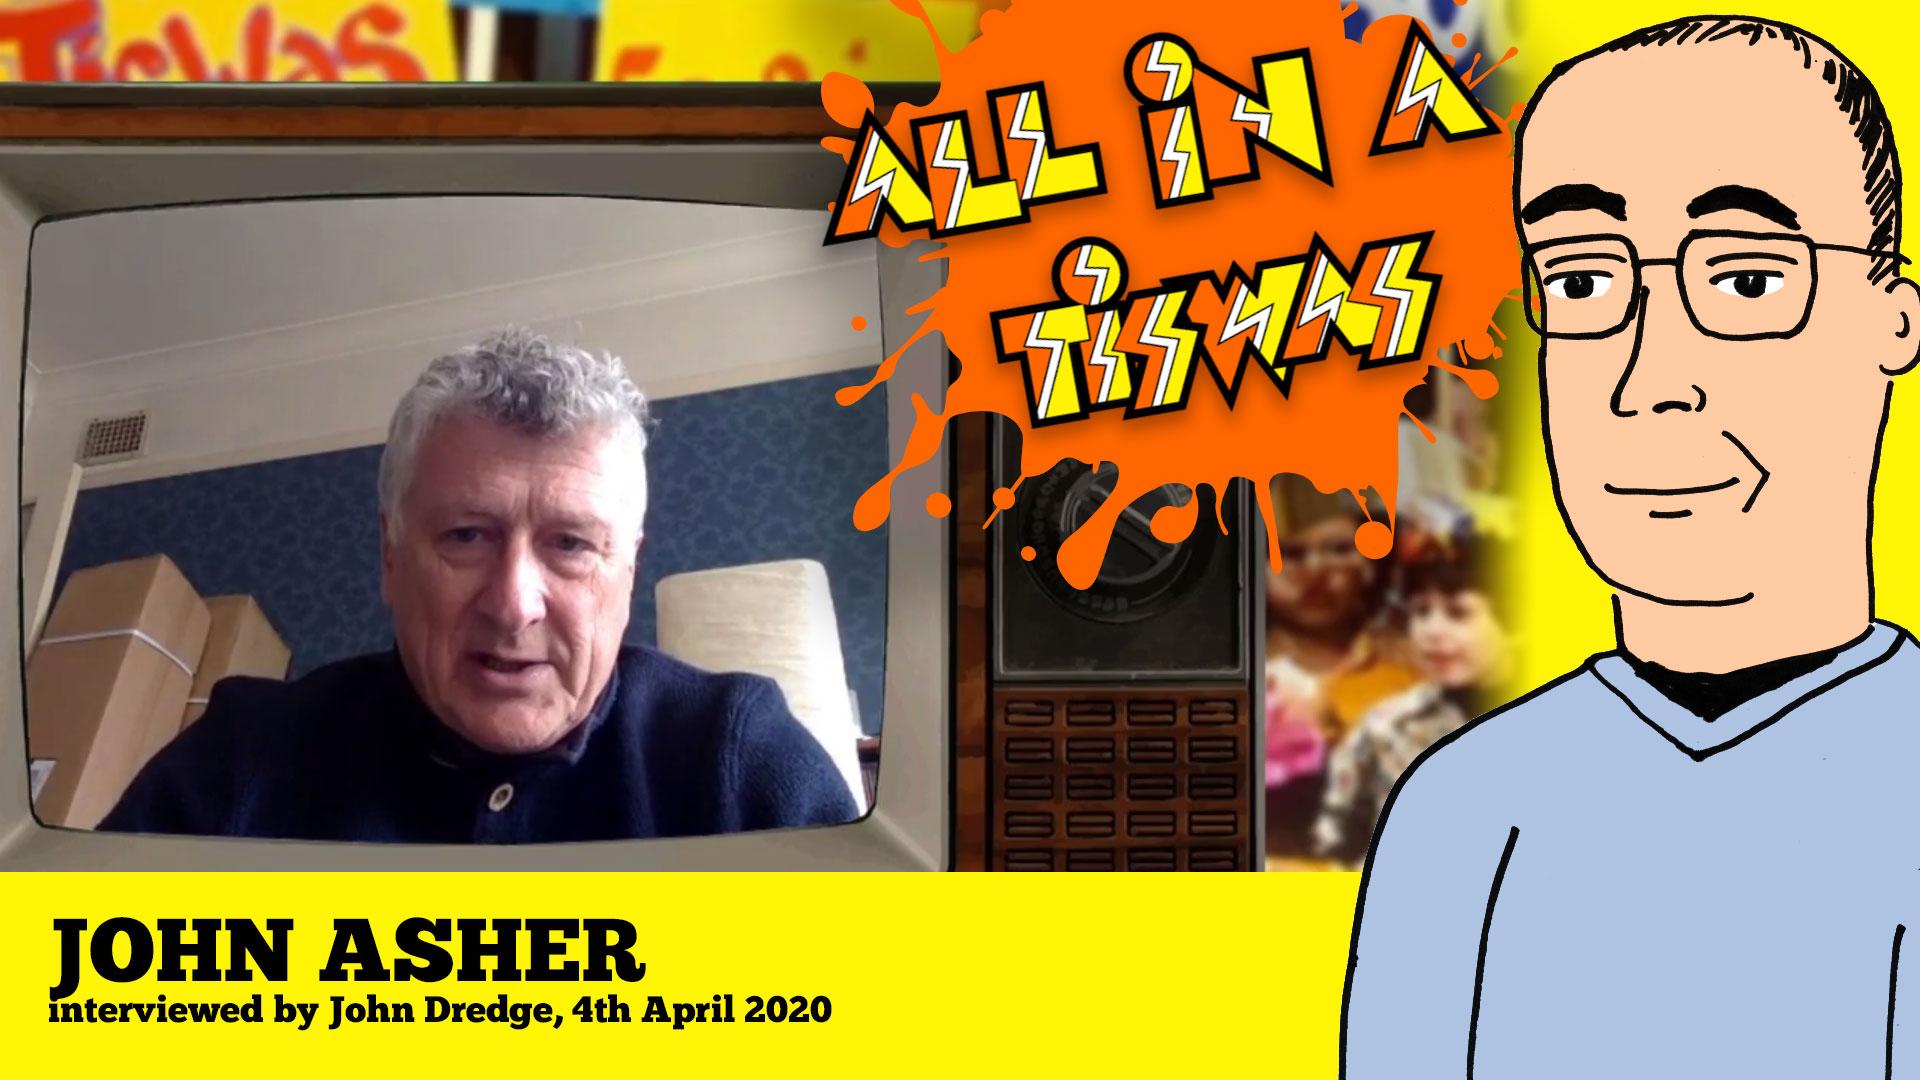 John Asher interviewed by John Dredge